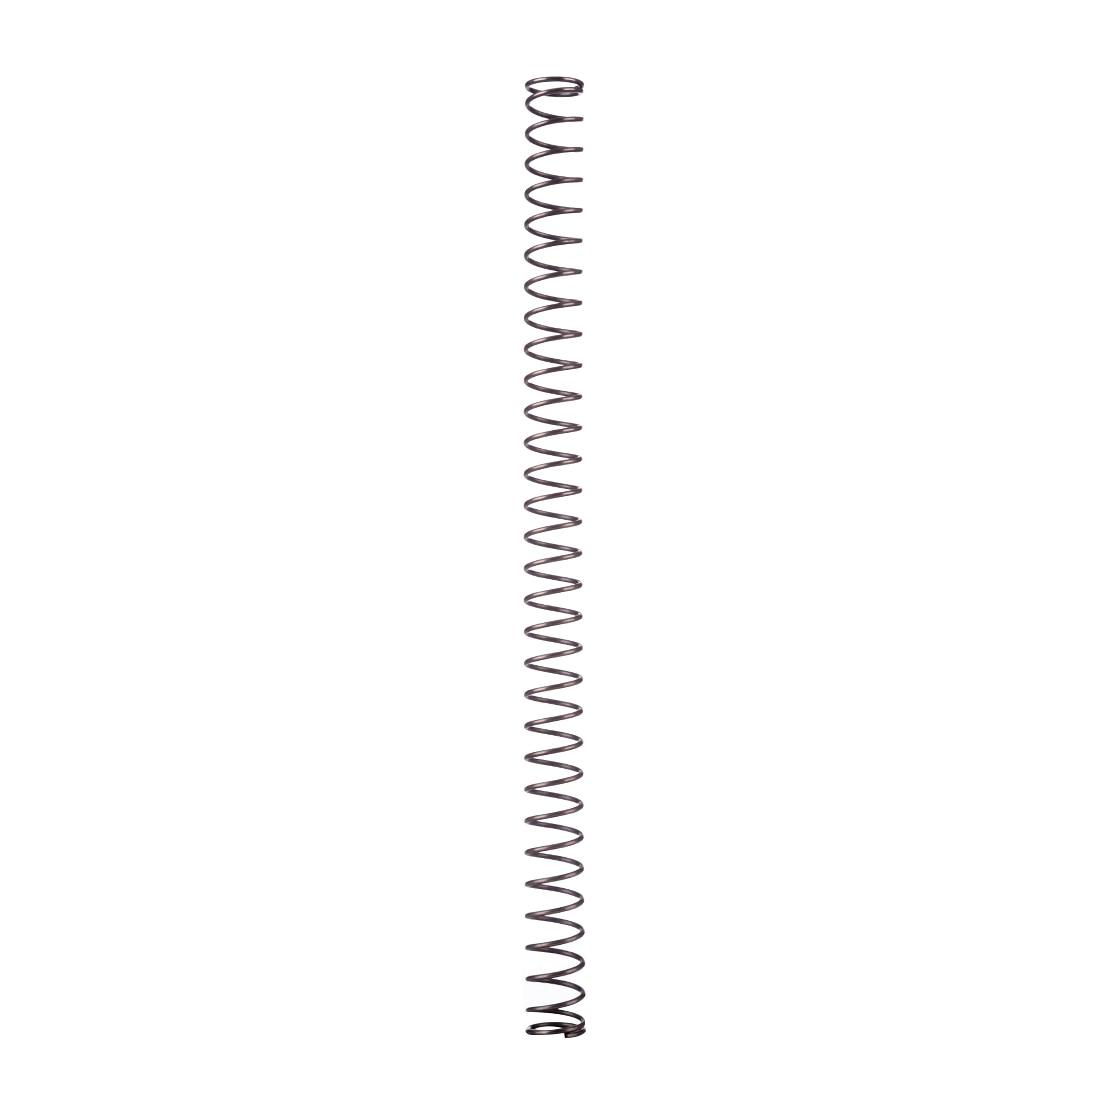 Modiker 6 tamaños 1,8*13,8*220*32 vueltas resorte de alta resistencia para GJ M24 agua Gel Beads Blaster-plata negro